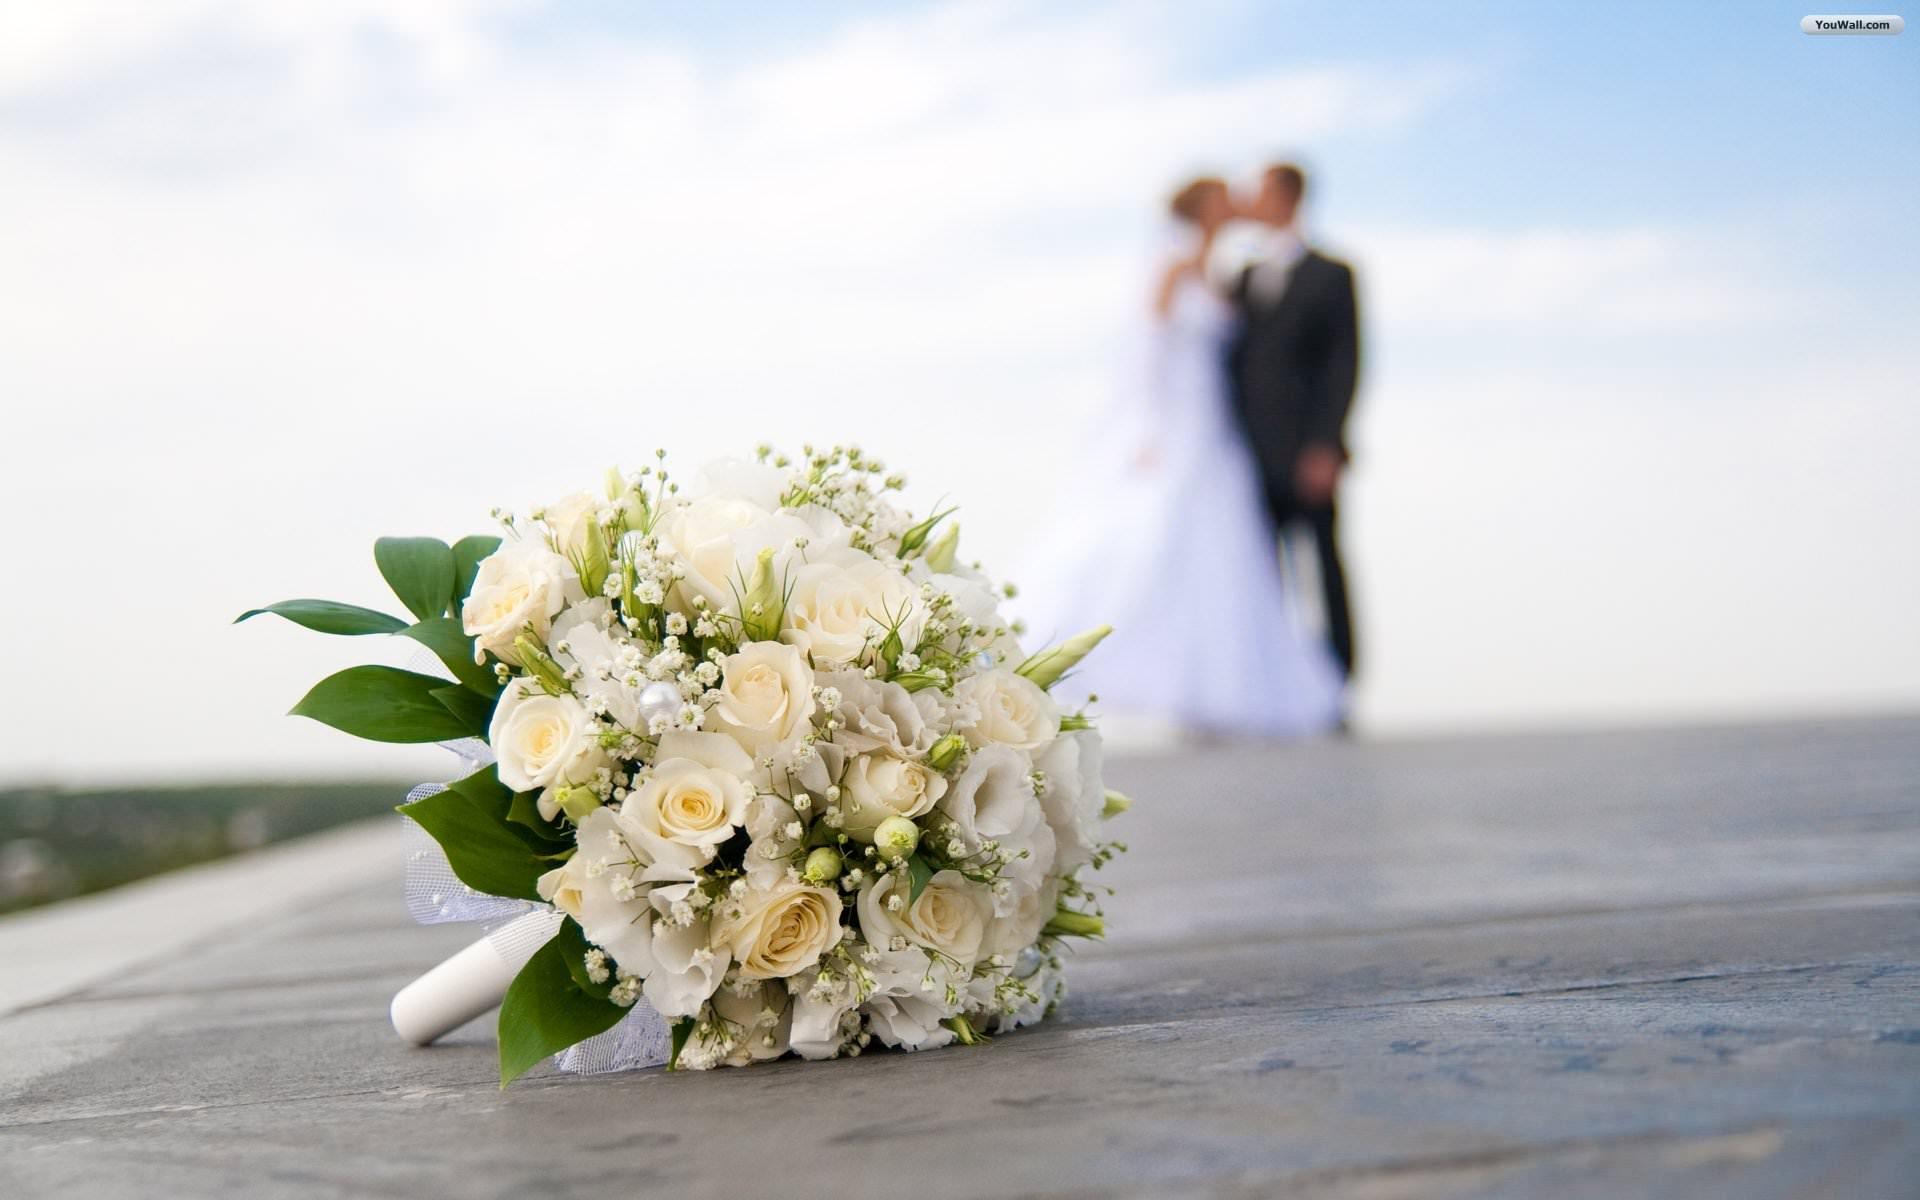 Wedding Wallpapers - Top Free Wedding Backgrounds - WallpaperAccess